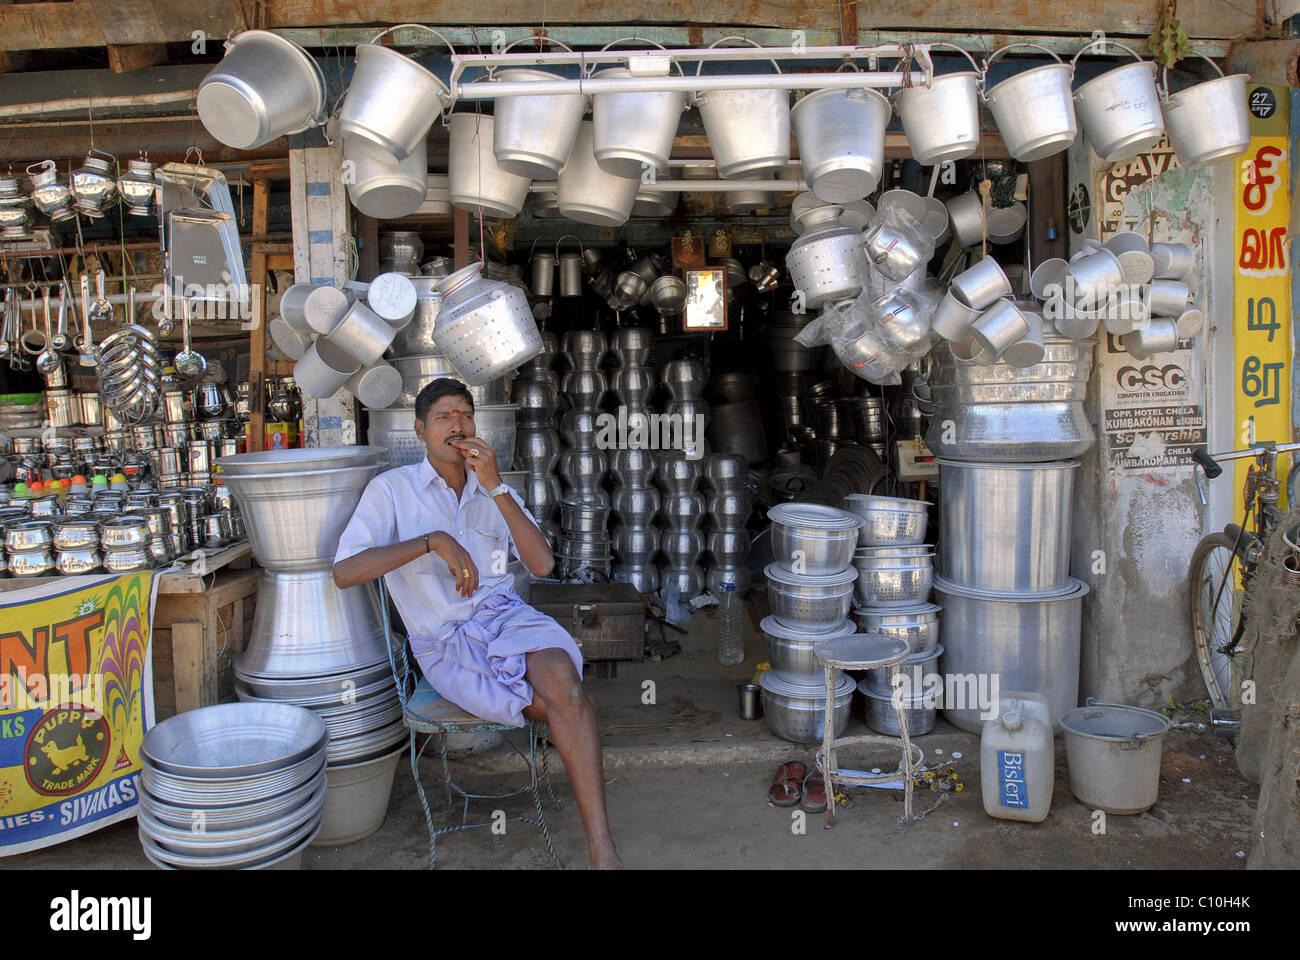 EIN SCHIFF-SHOP IN KUMBAKONAM TAMILNADU Stockbild